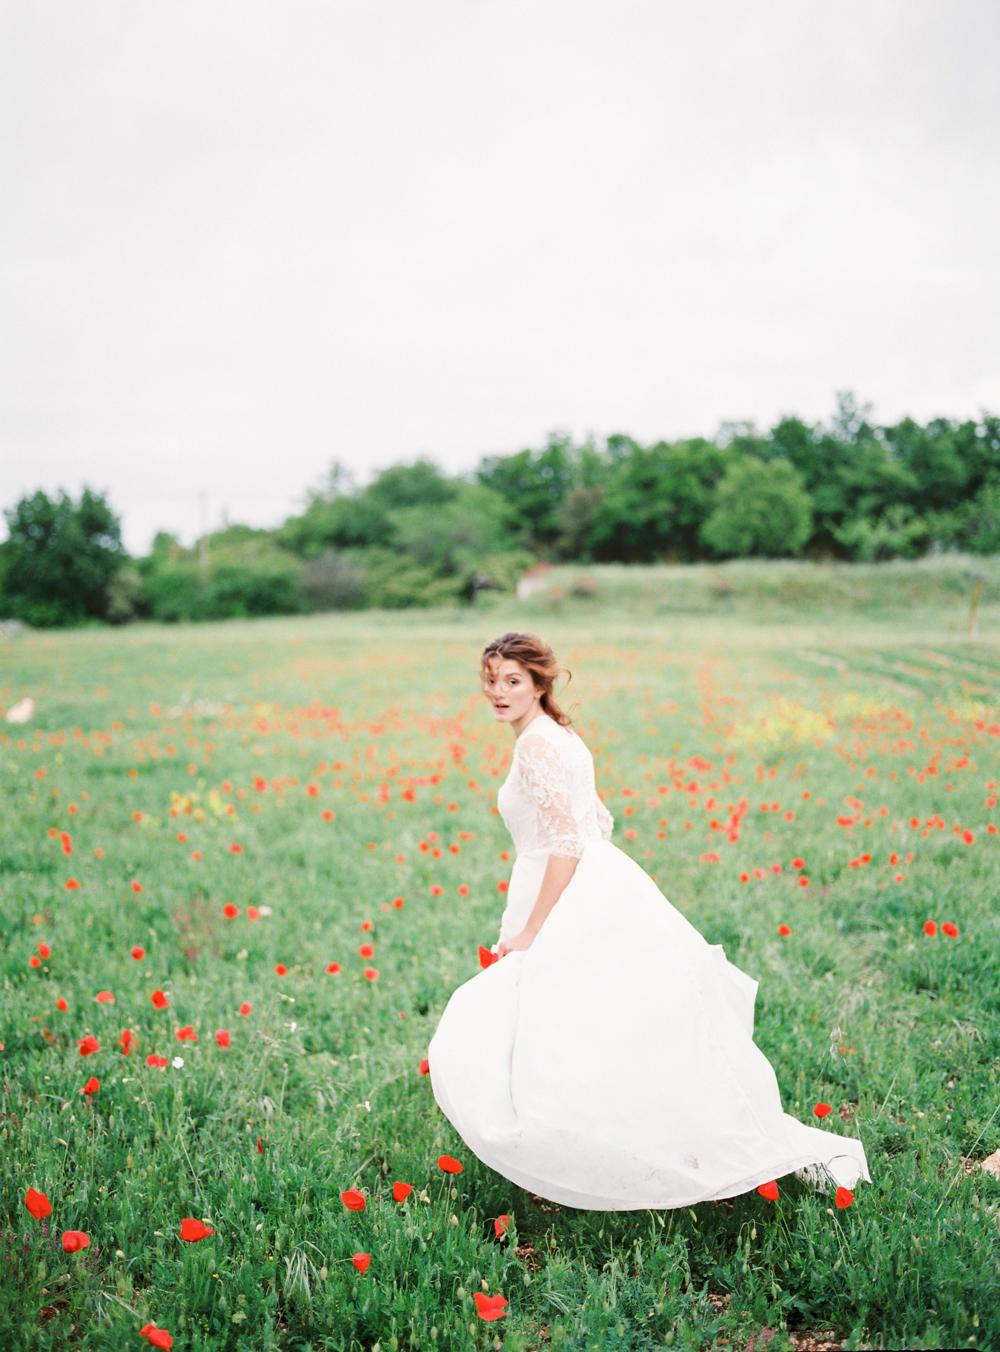 celine_chhuon_photography_Provence_Bride118.jpg